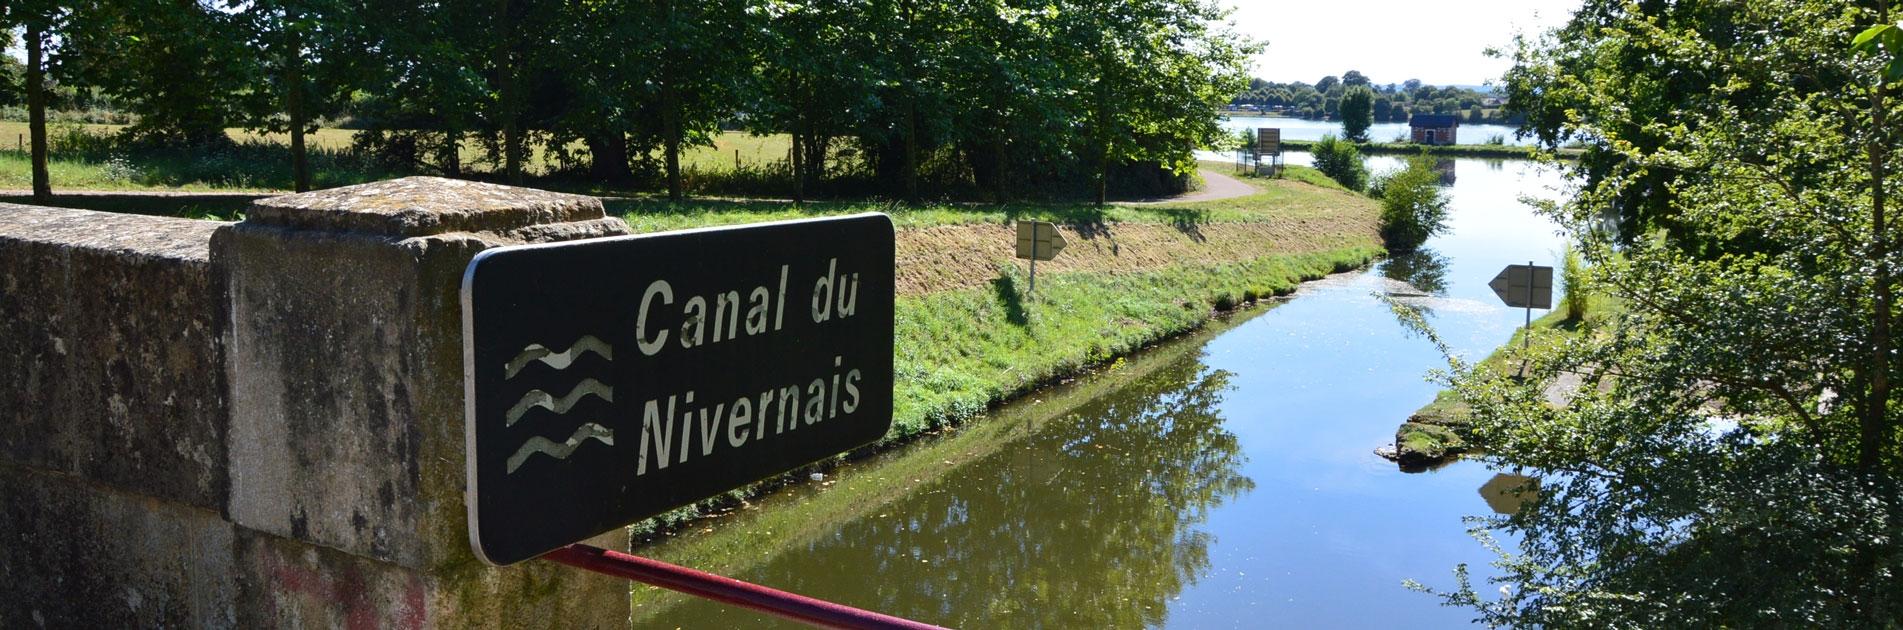 Canal du Nivernais i Bourgogne